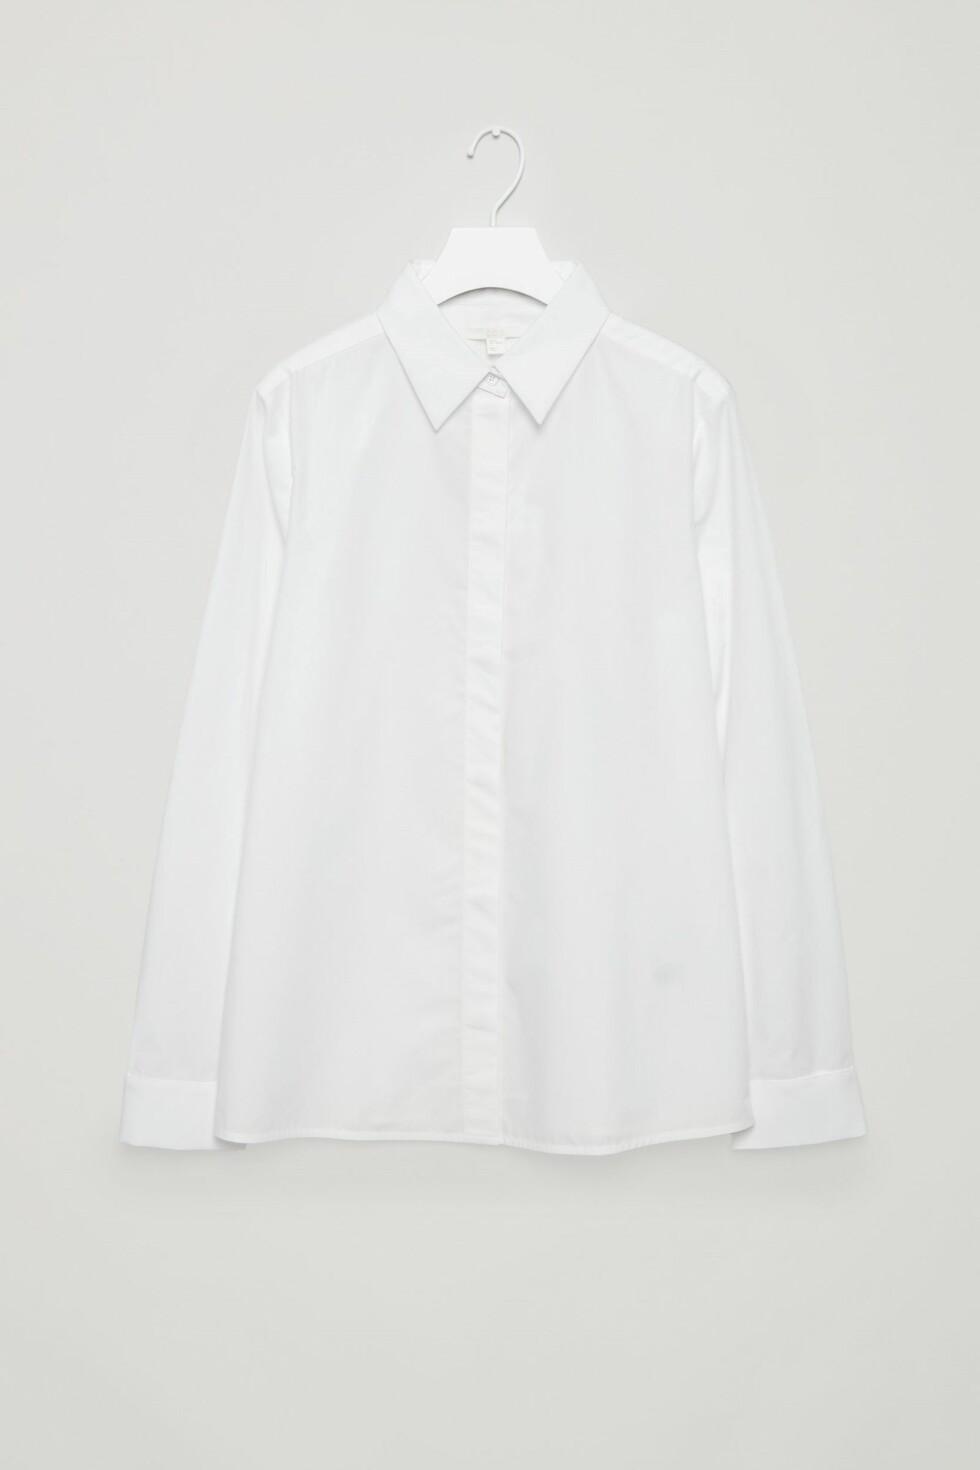 Skjorte fra COS | kr 700 | http://www.cosstores.com/gb/Women/Shirts/Detachable_cuffs_and_collar_shirt/10898847-72737073.1#c-24479